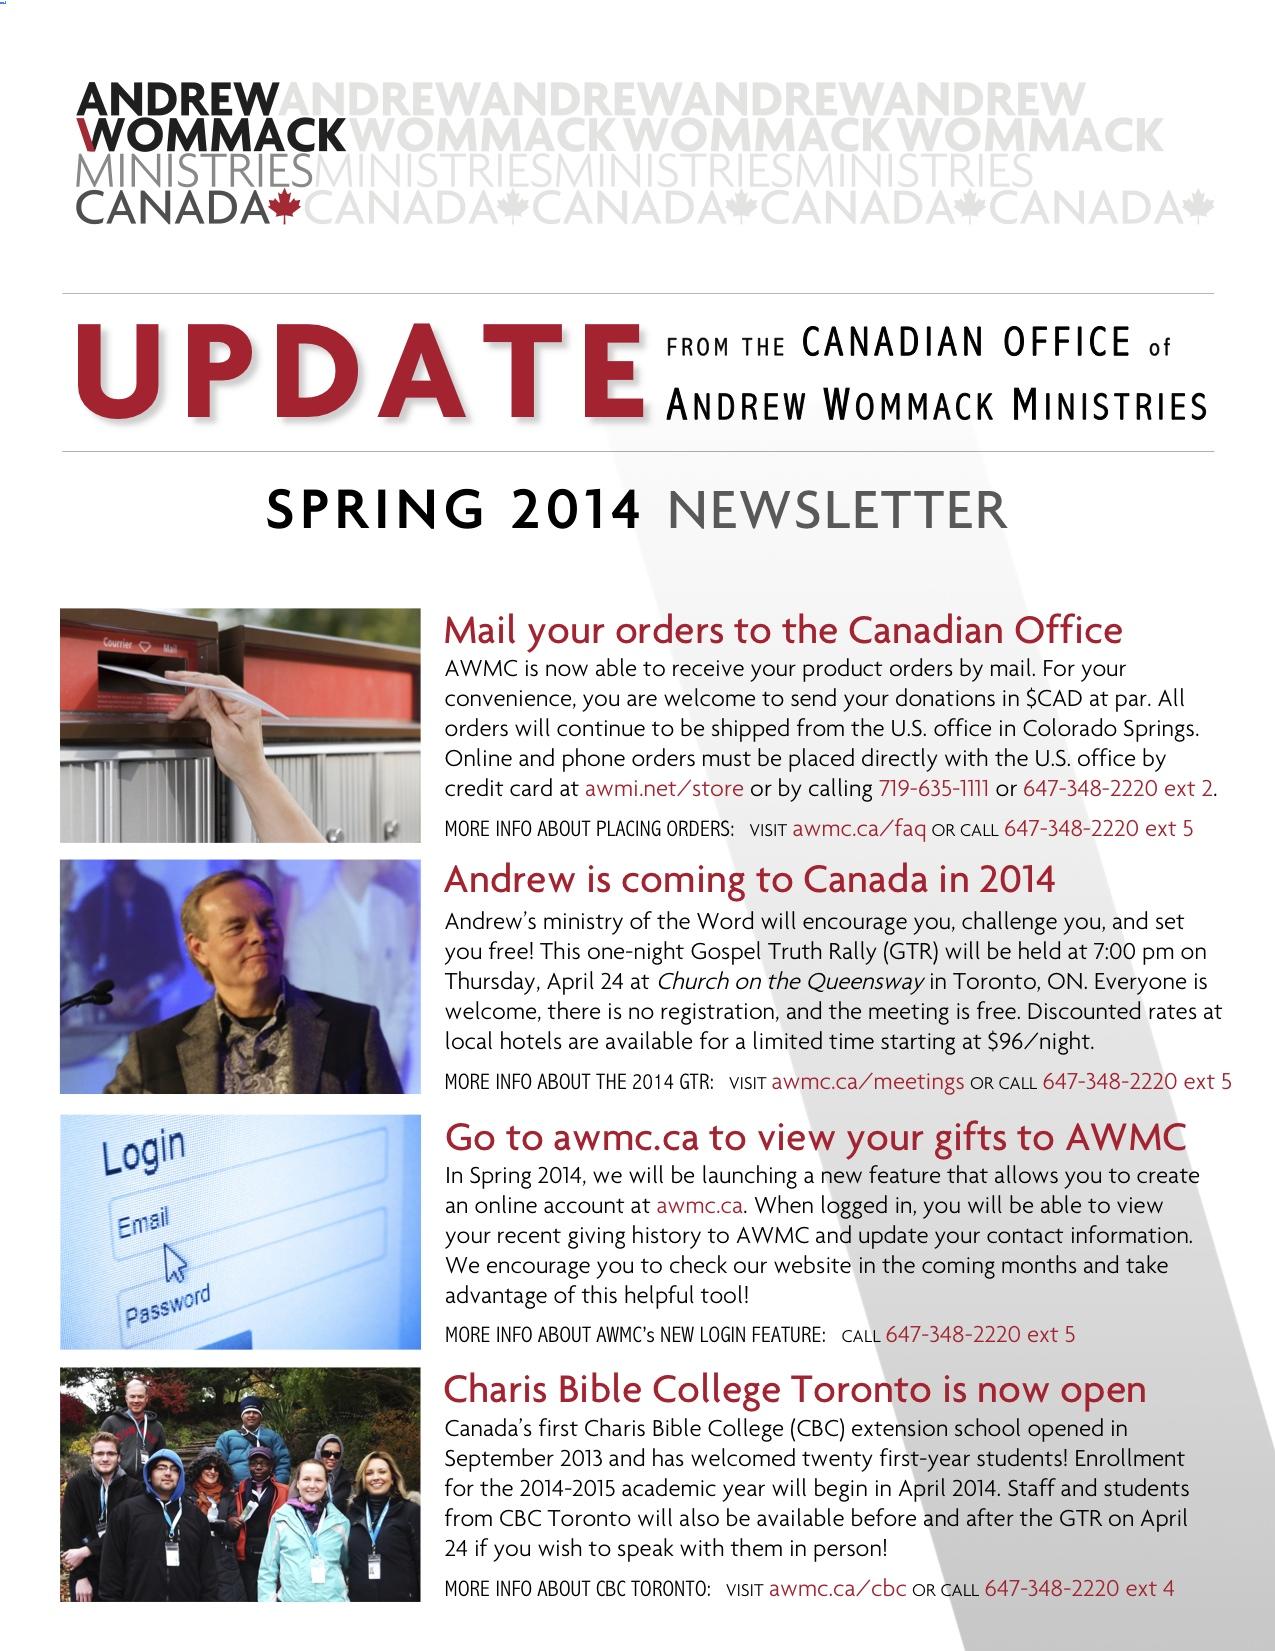 AWMC Spring 2014 Newsletter